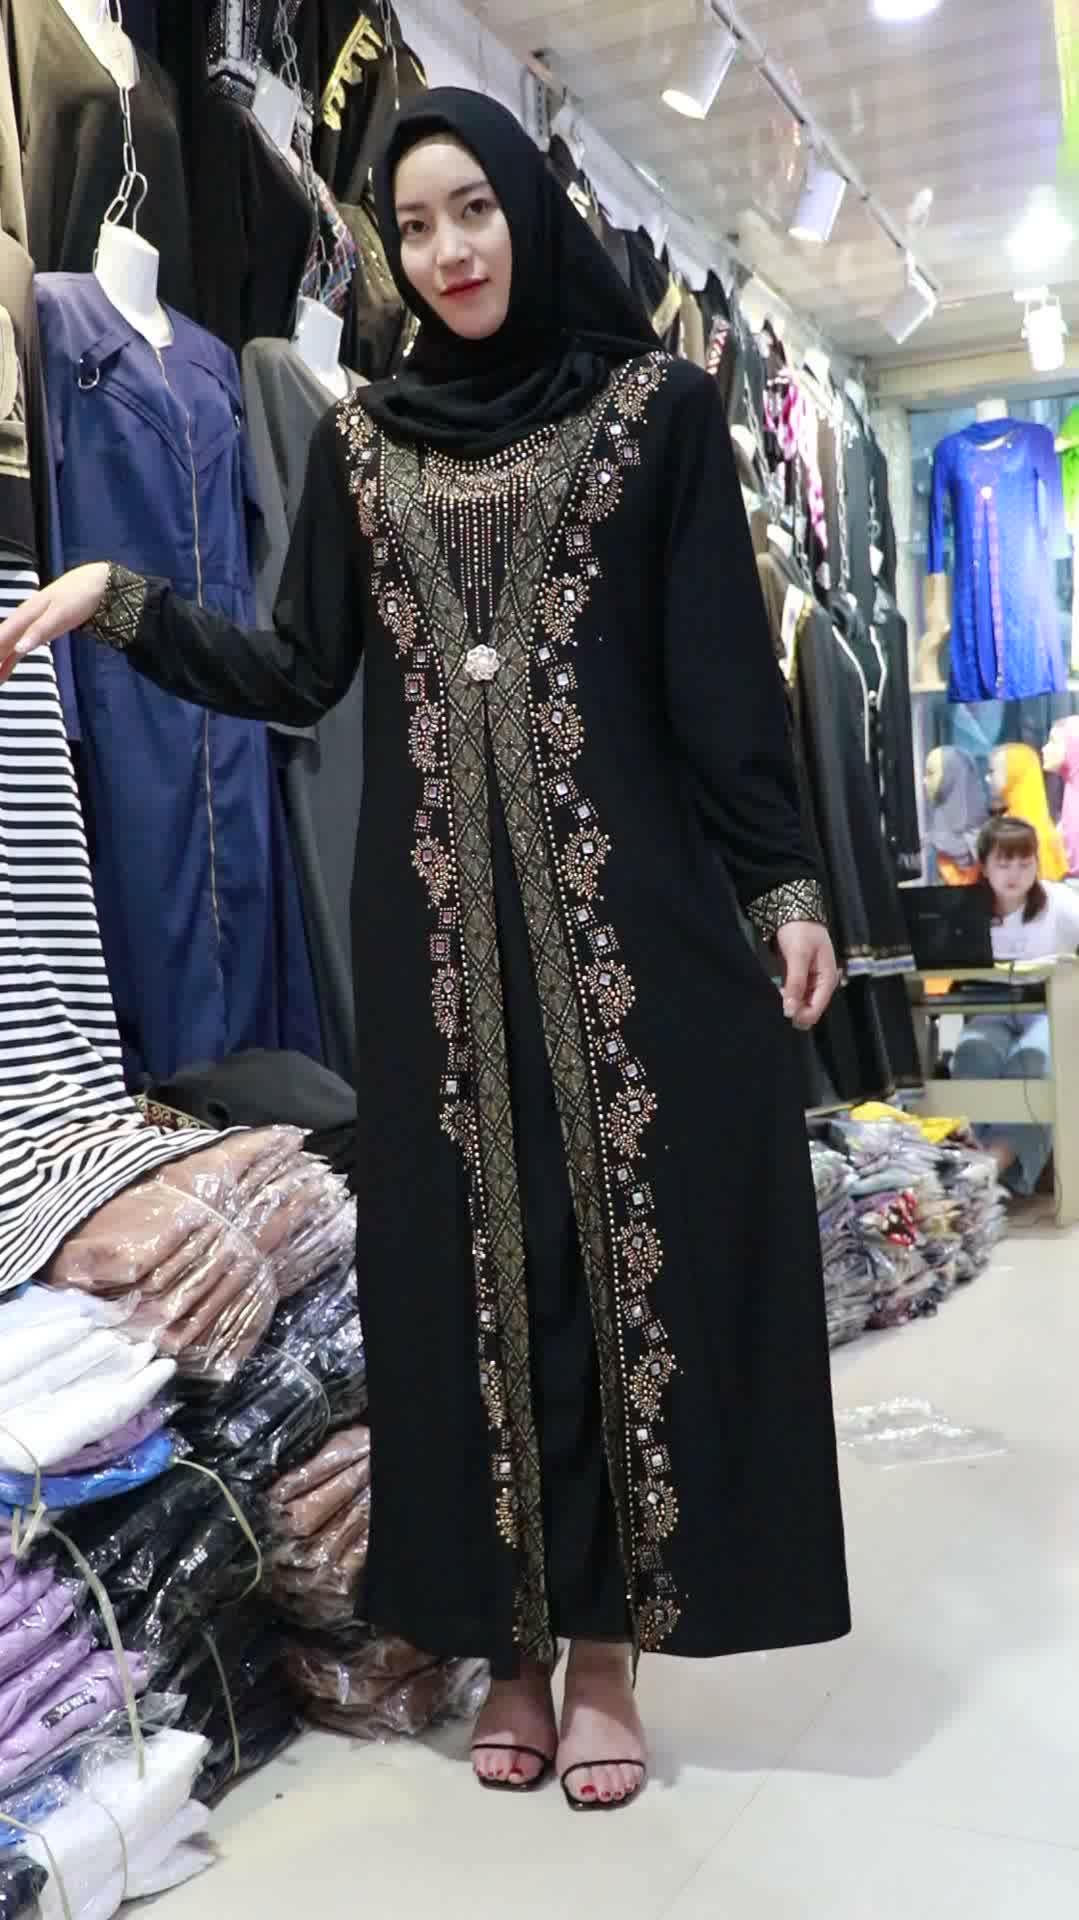 Grosir Murah Pakaian Muslim Abaya Gaun Wanita Plus Ukuran